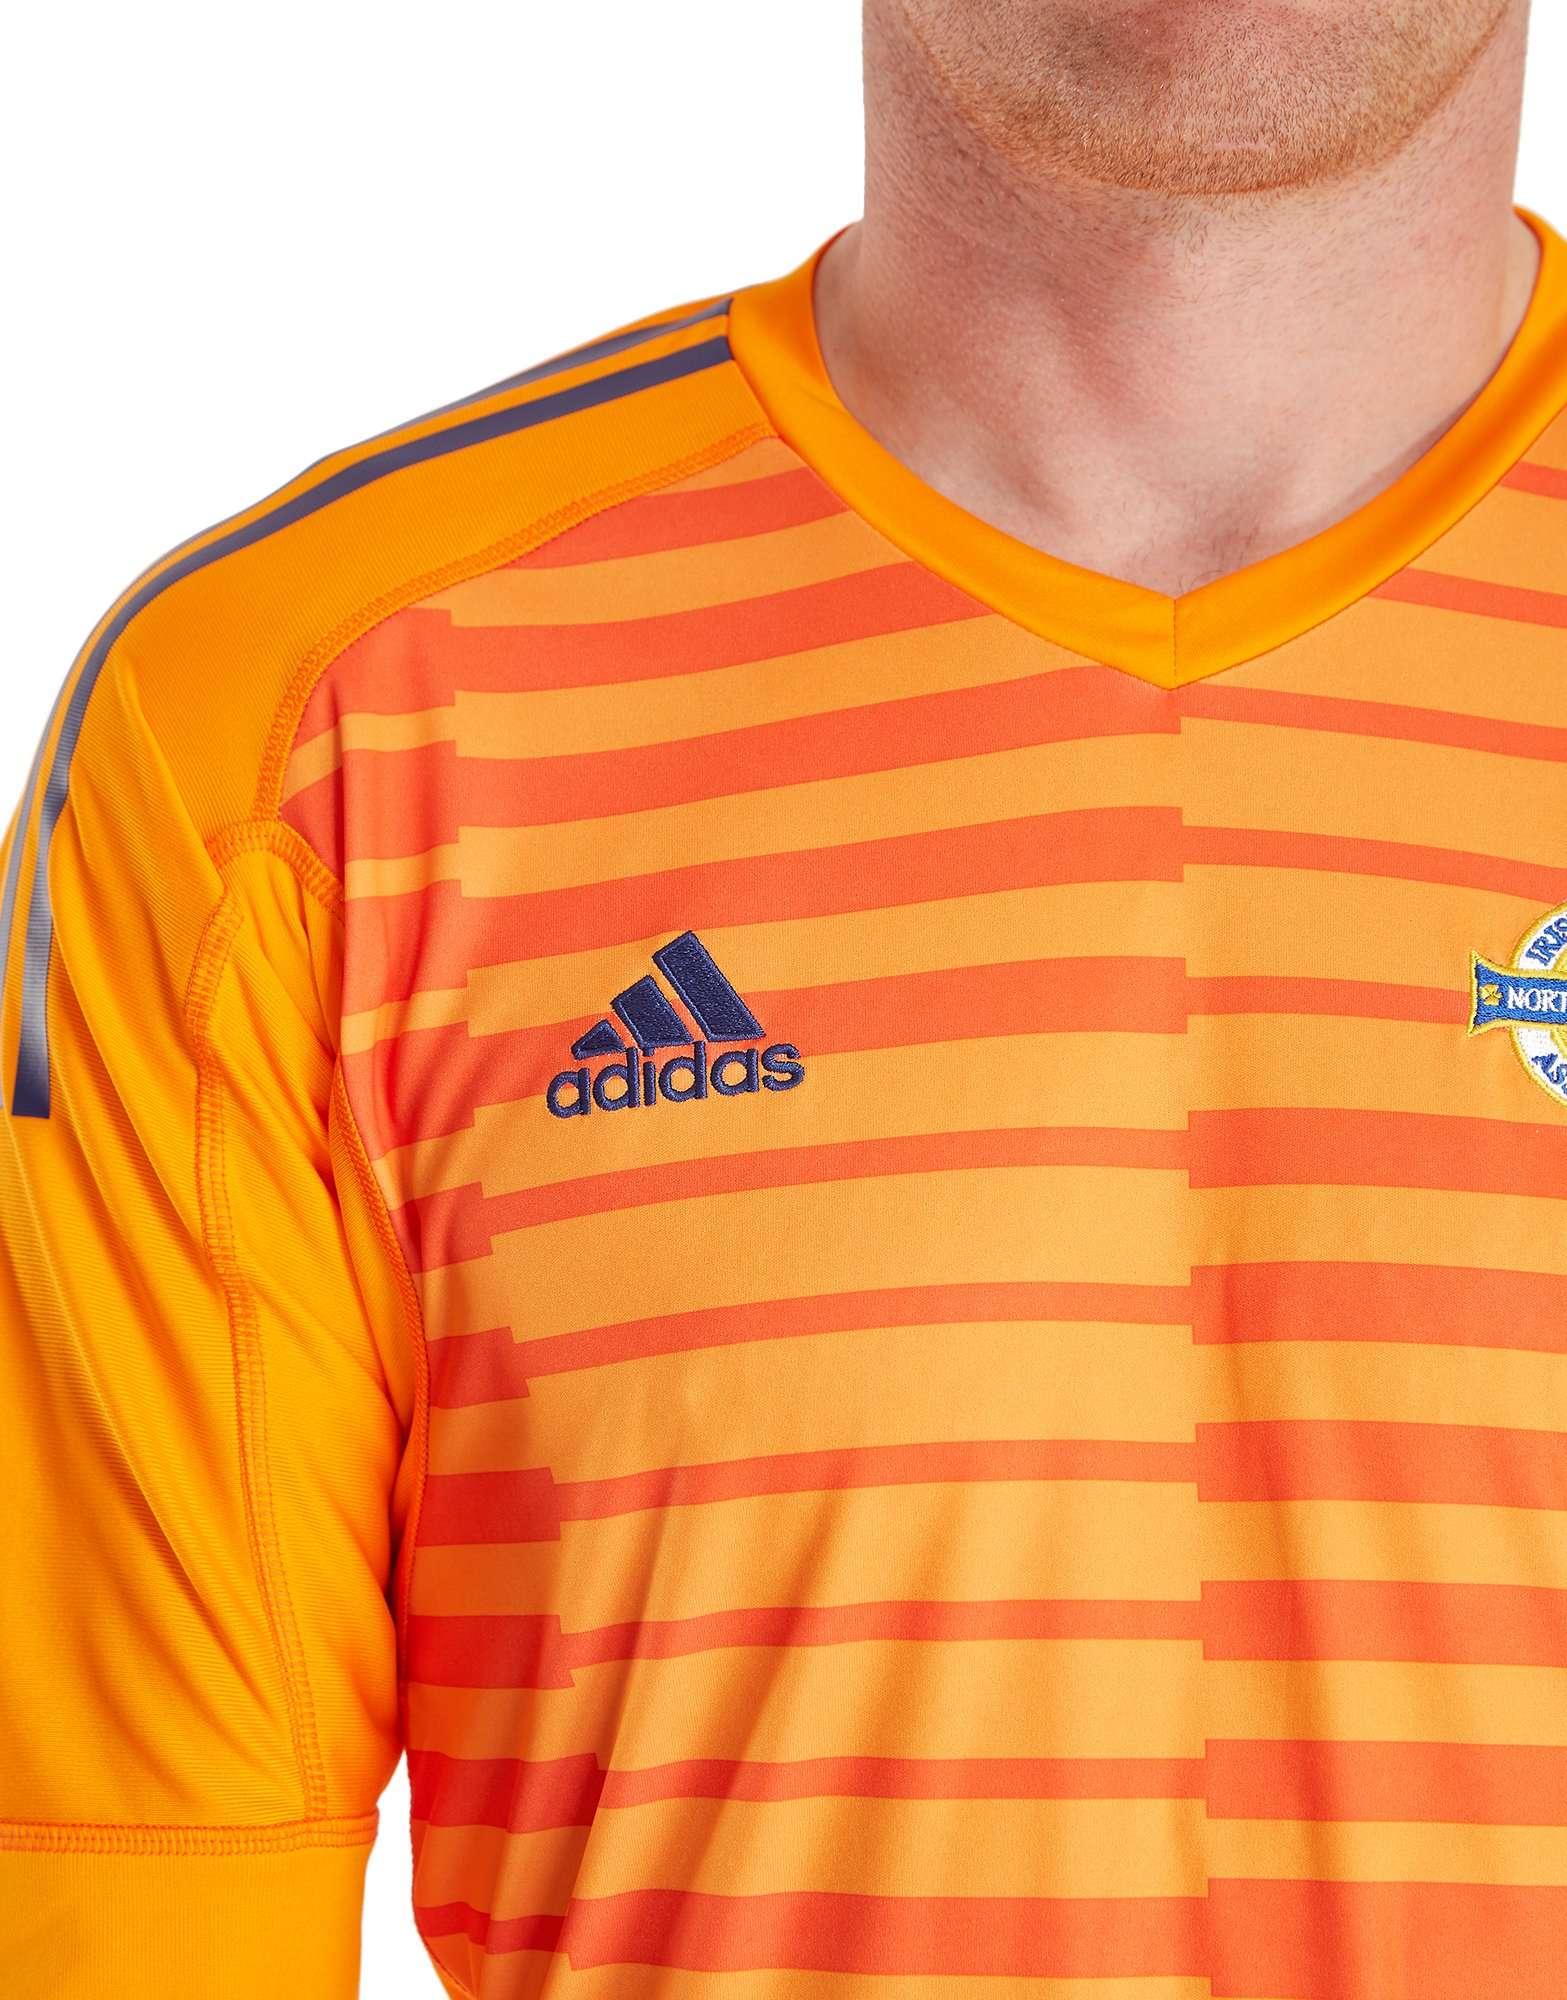 adidas Northern Ireland 2018/19 Home Goalkeeper Shirt